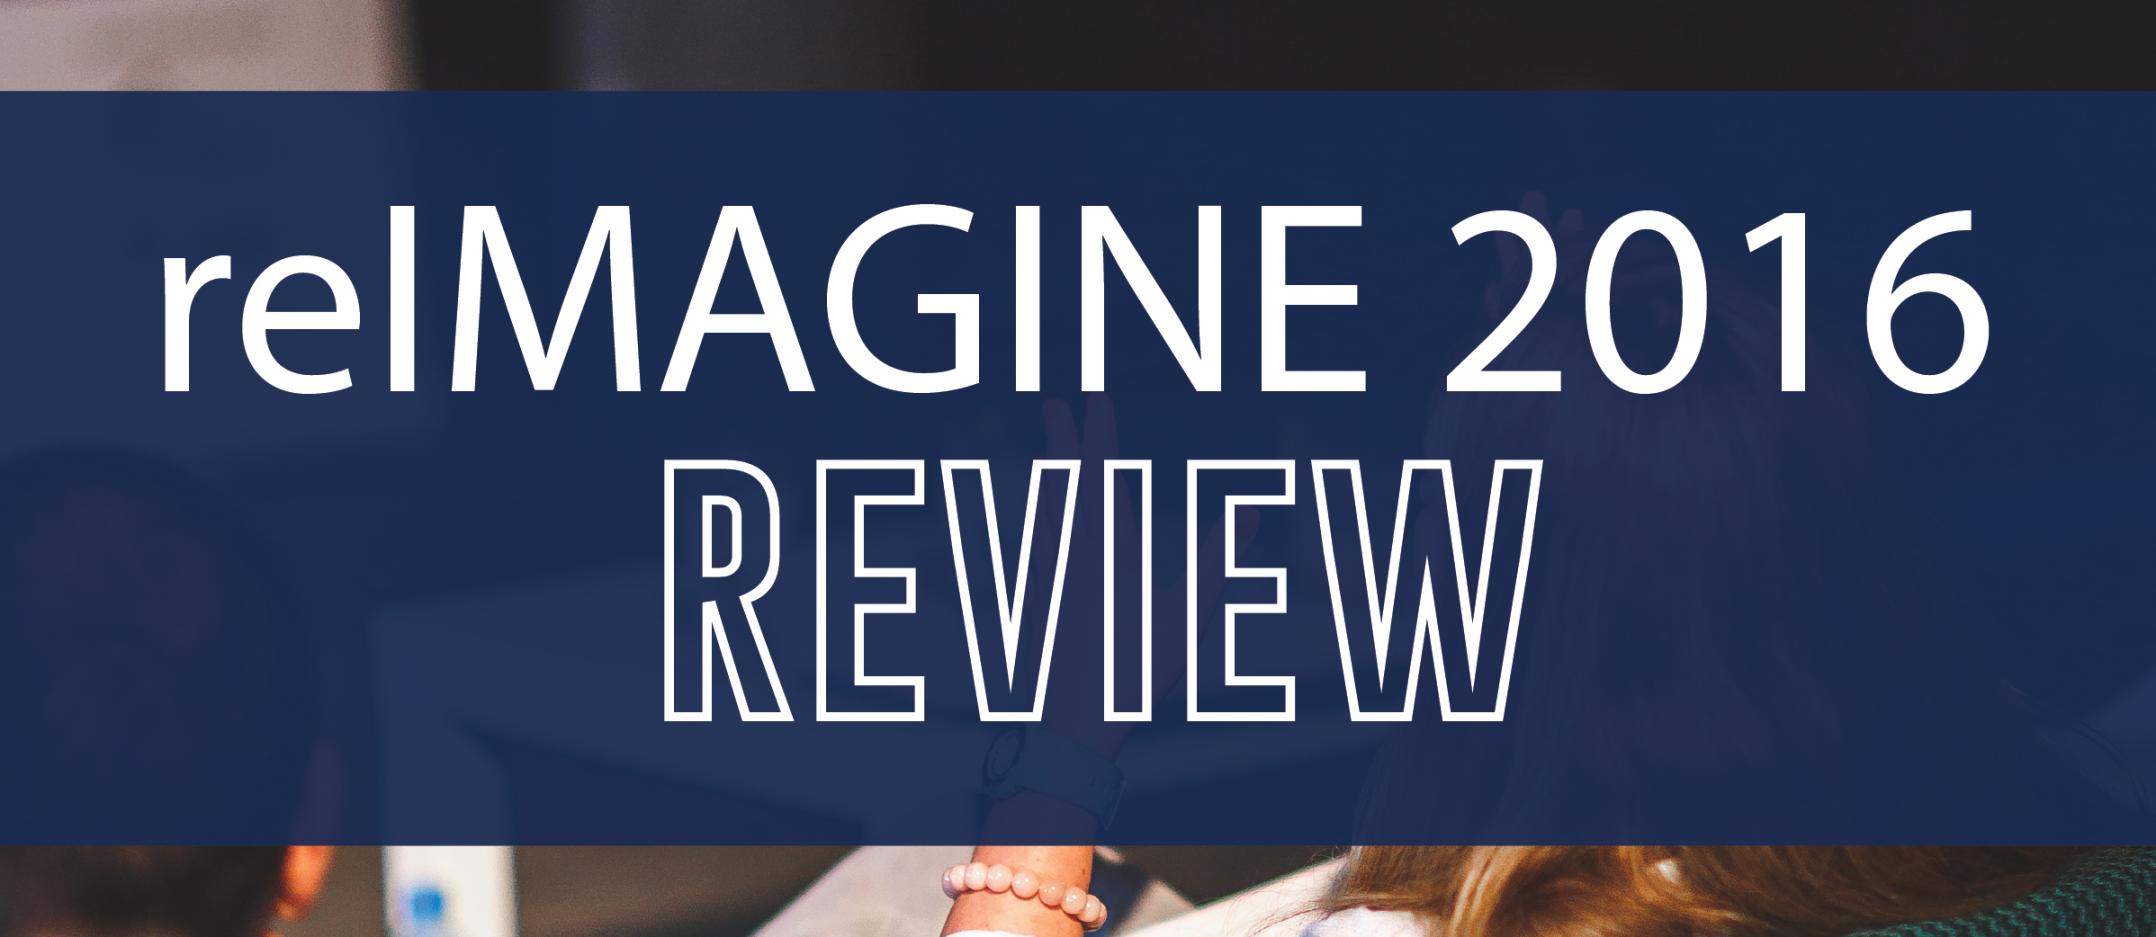 reimagine-review-01